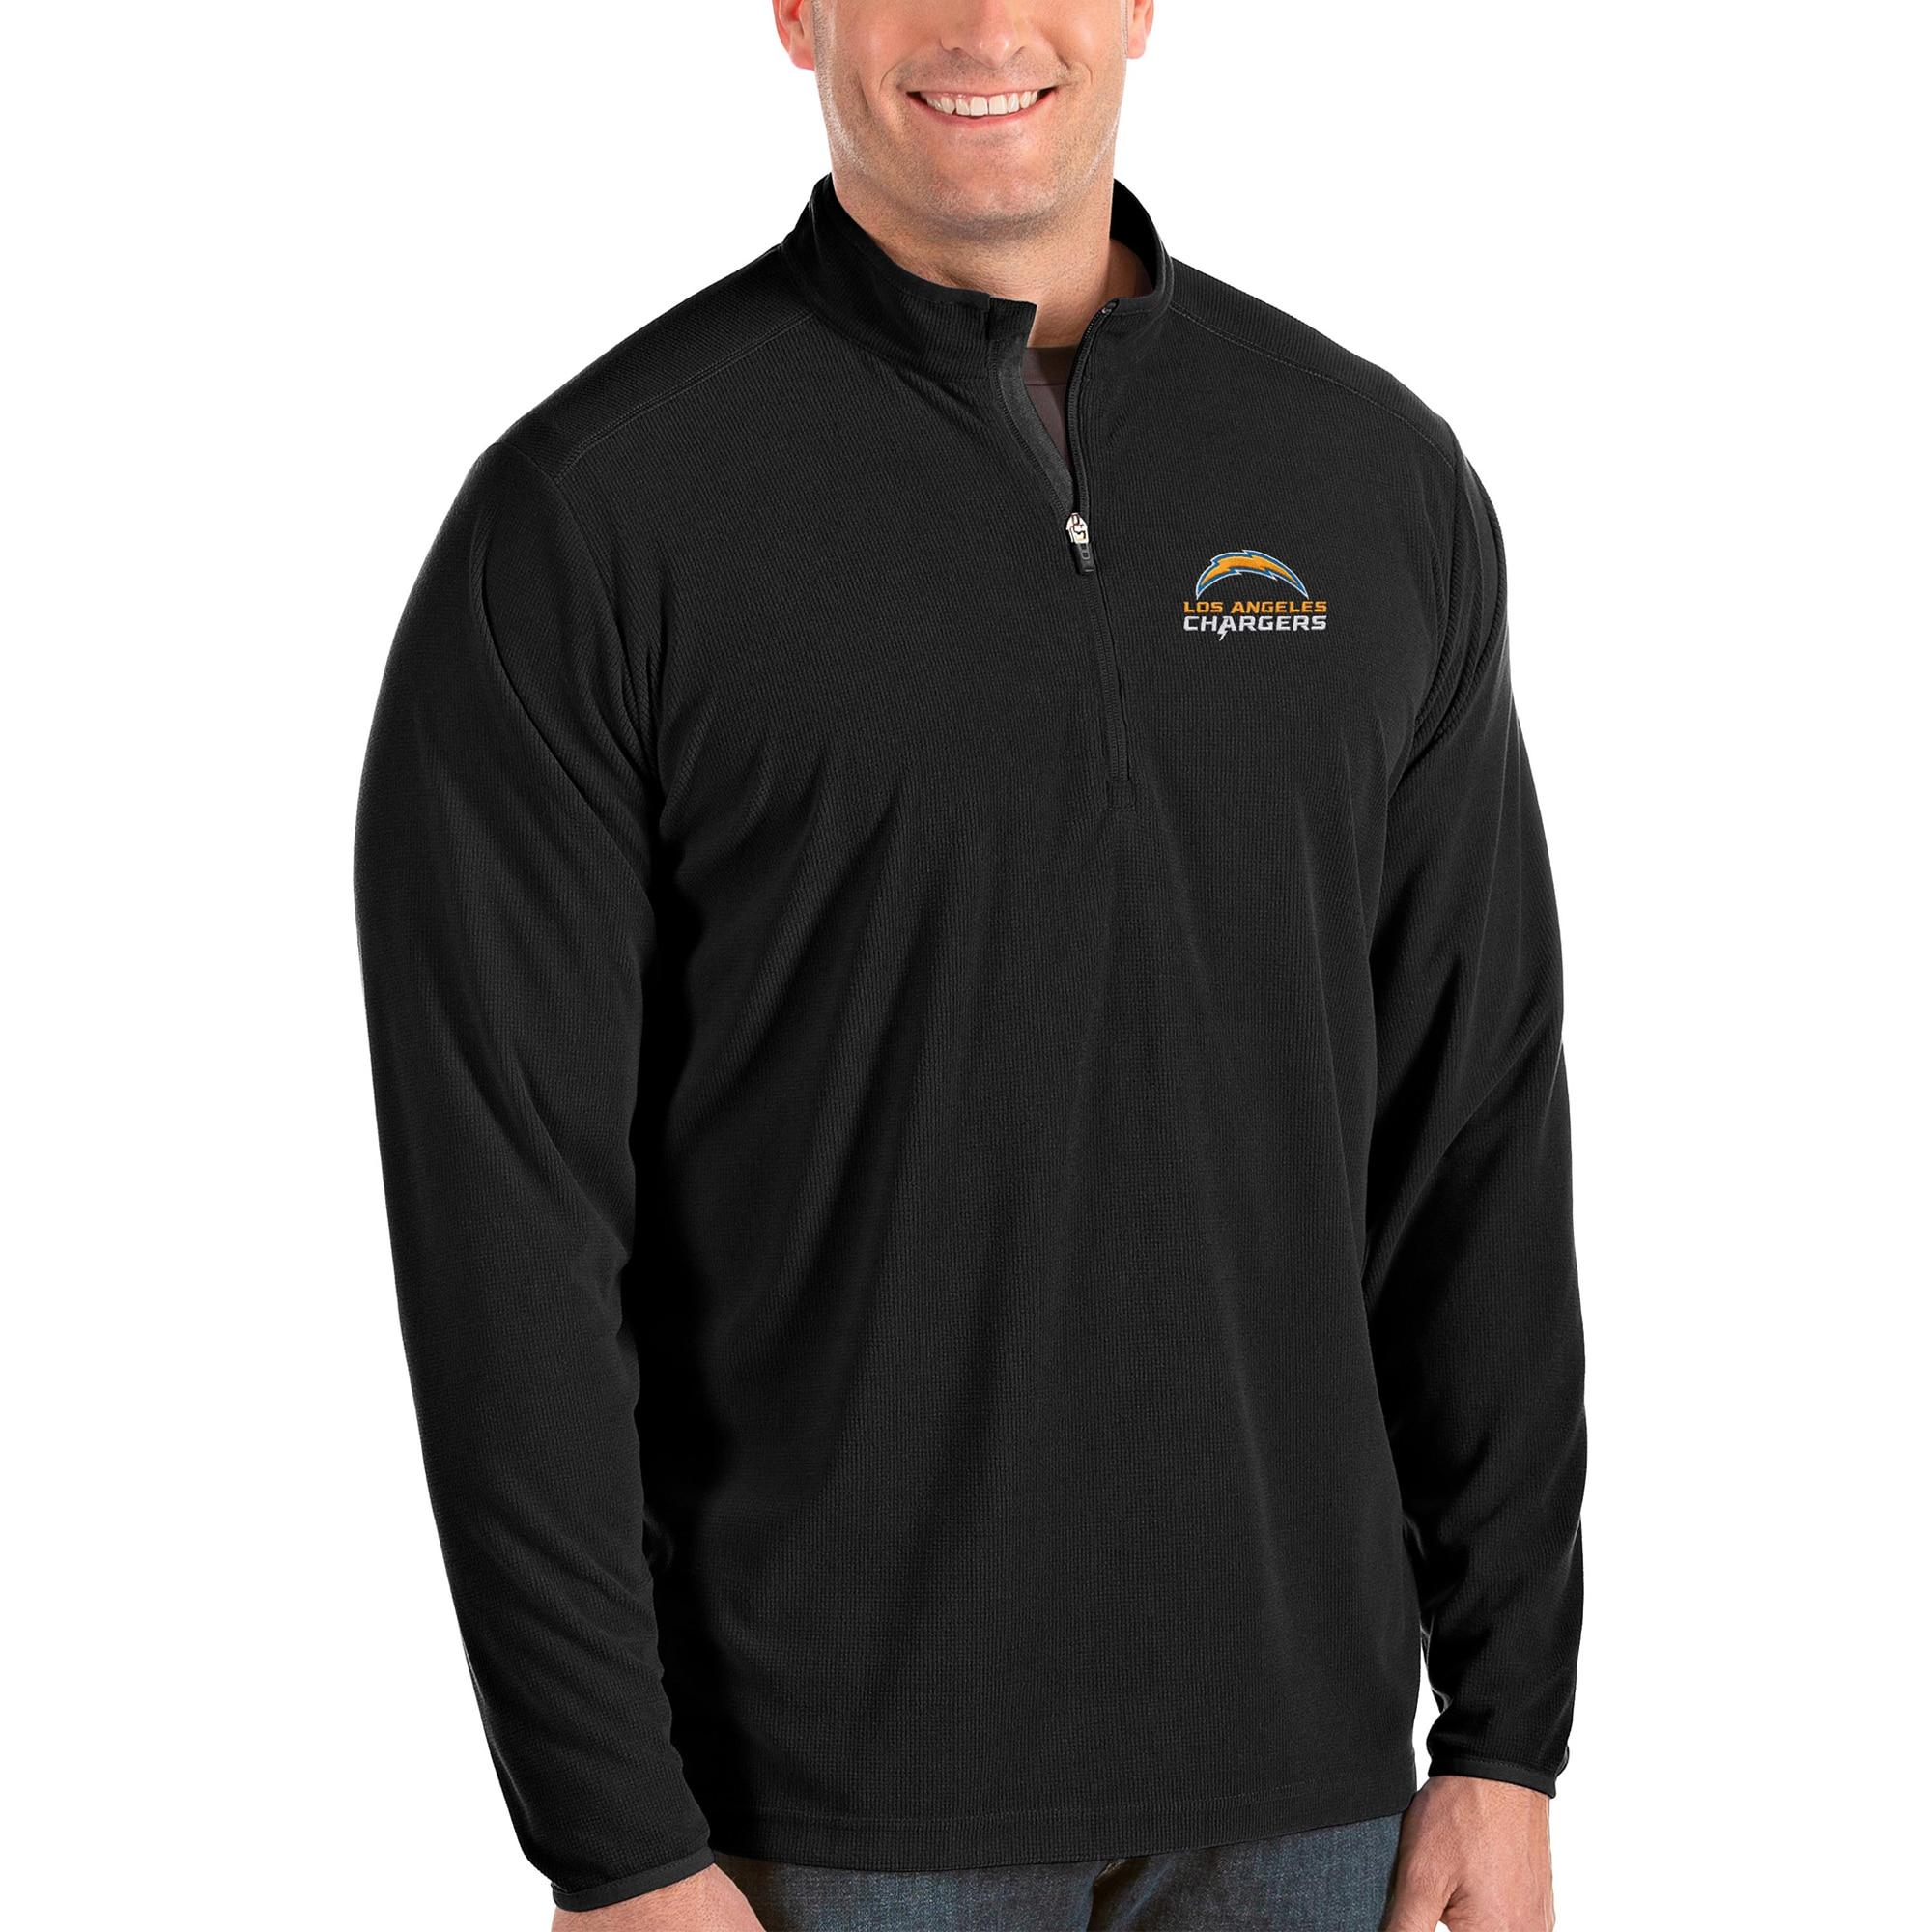 Los Angeles Chargers Antigua Big & Tall Glacier Quarter-Zip Pullover Jacket - Black